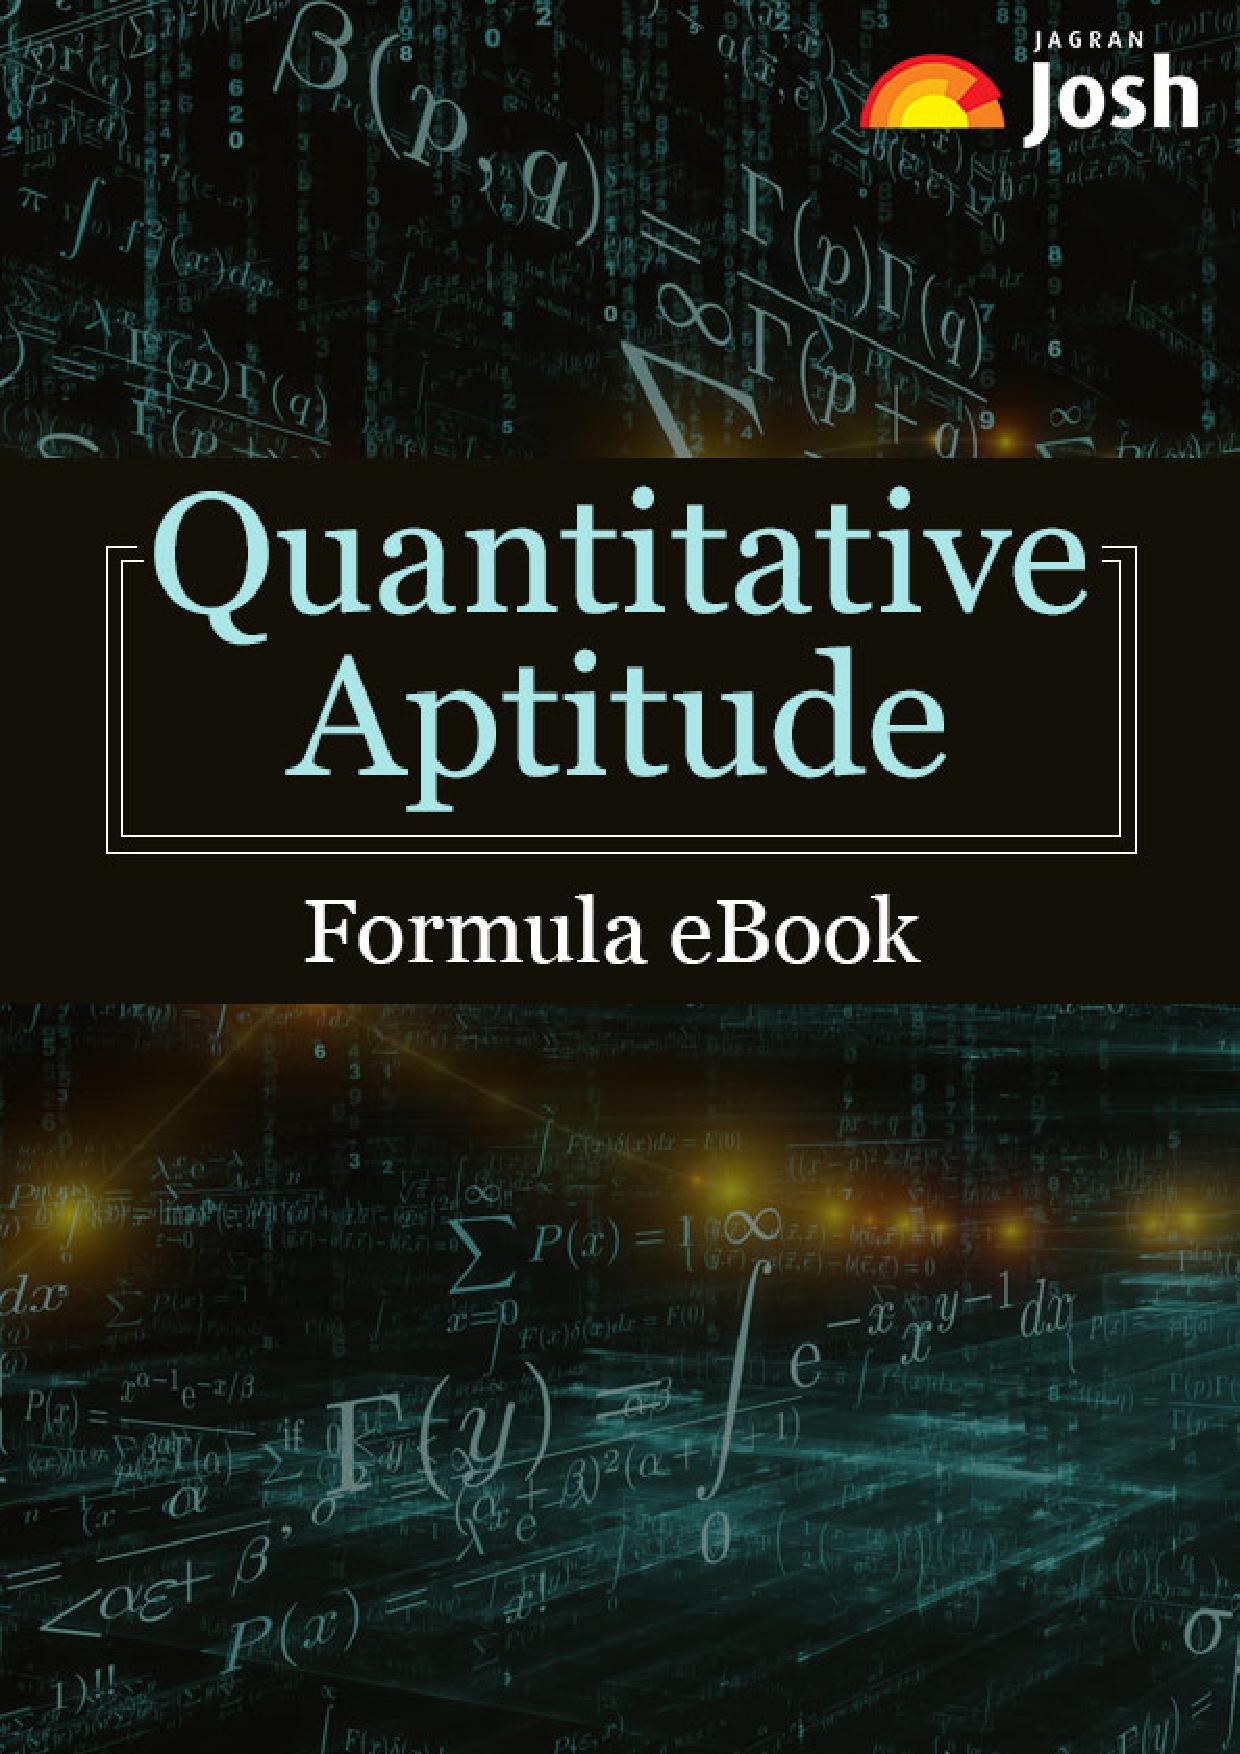 Quantitative Aptitude Formula ebook - Page 1